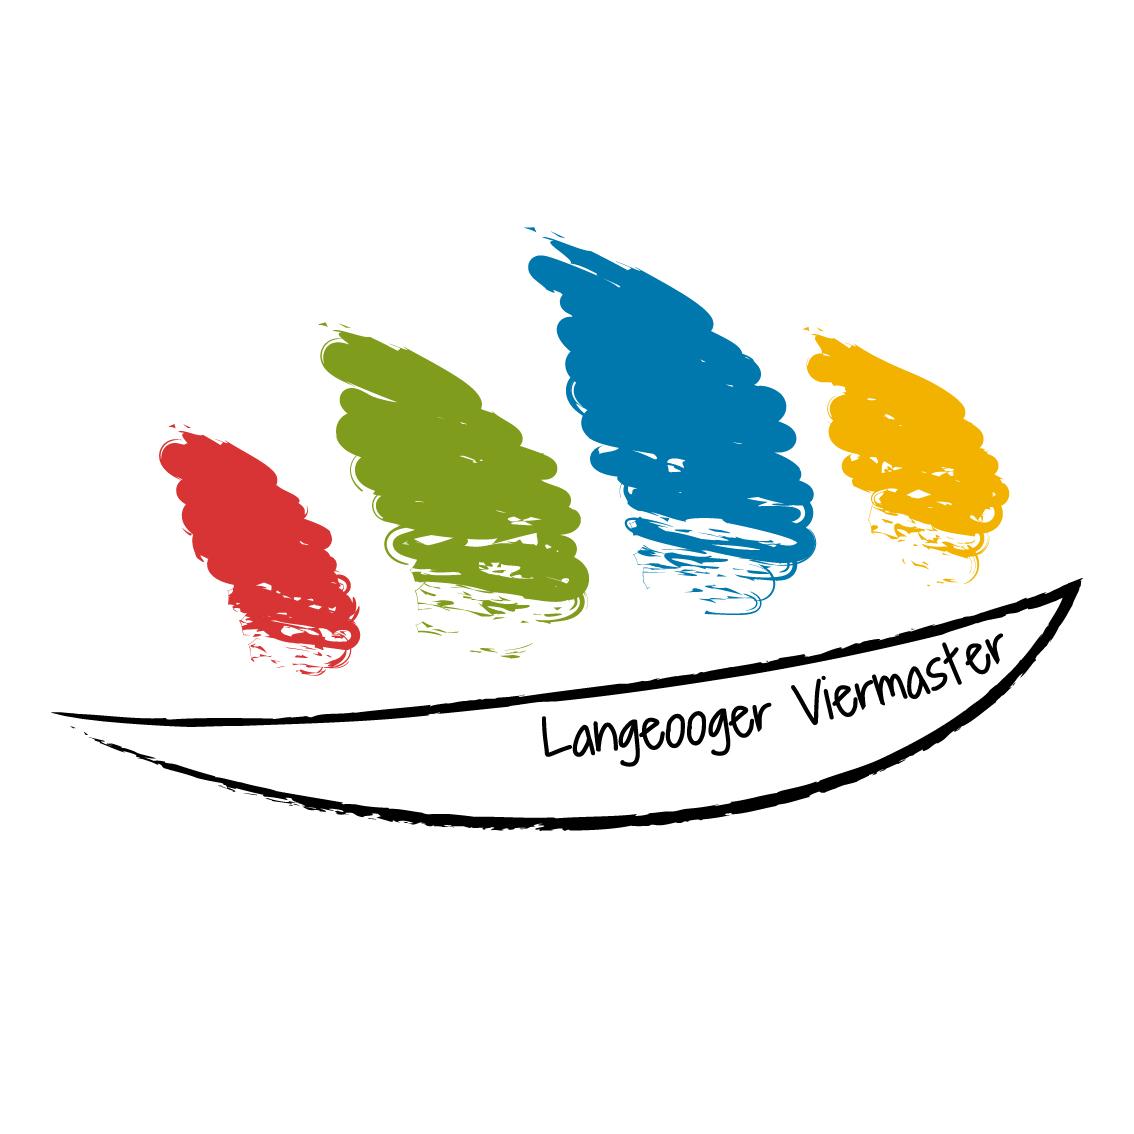 Langeooger Viermaster